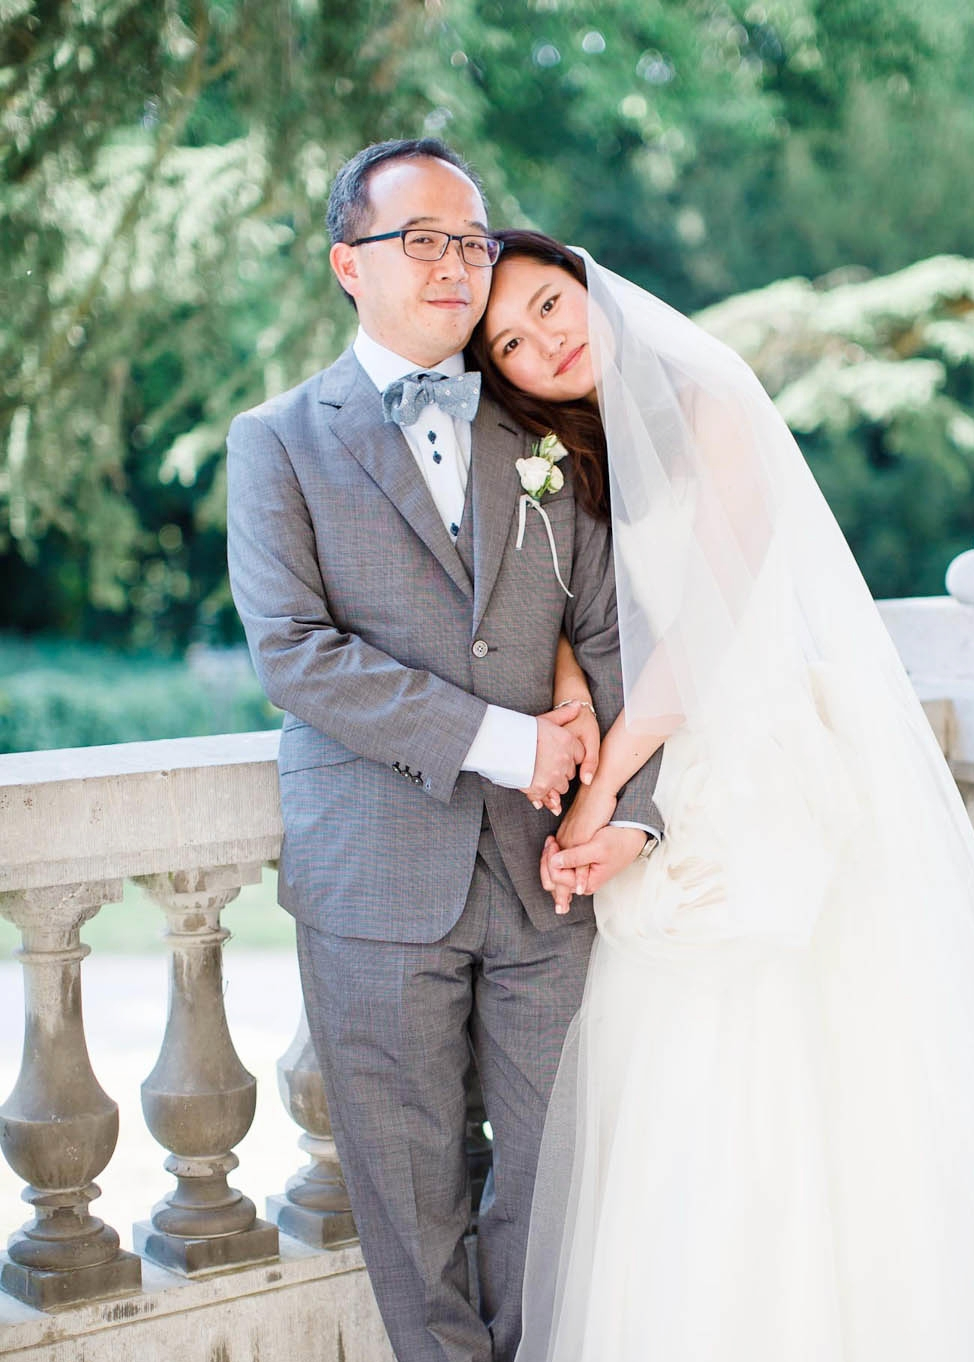 Amy O'Boyle Photography, Destination & UK Fine Art Film Wedding Photographer, France Wedding Photographer, Chateau Bouffemont Wedding-25.jpg